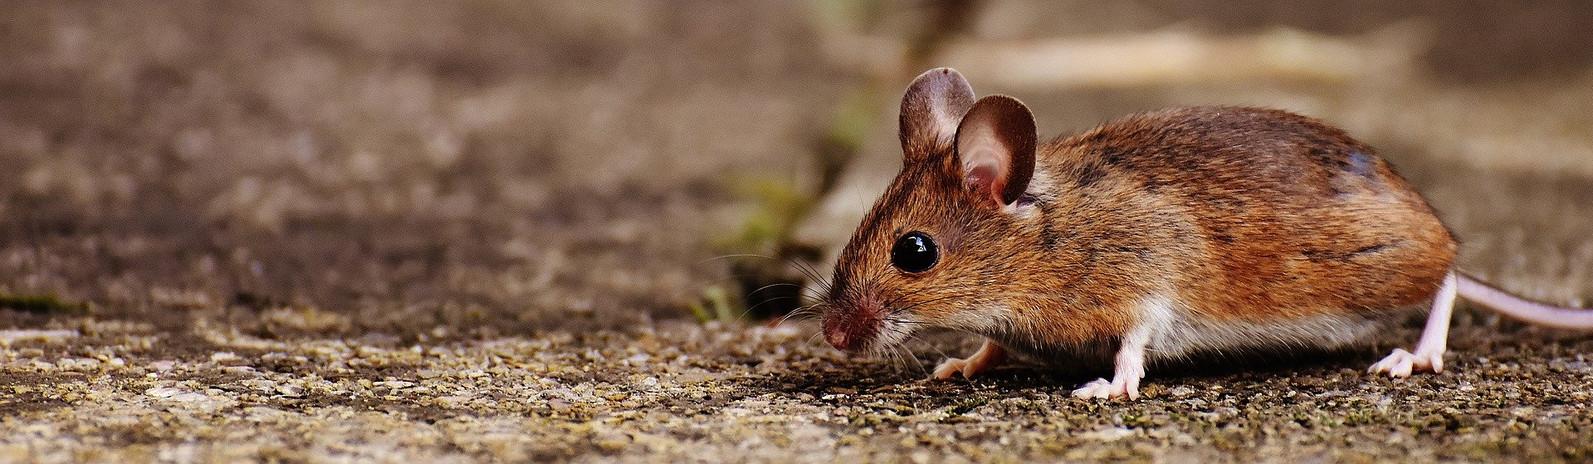 mouse-1708379_1920.jpg